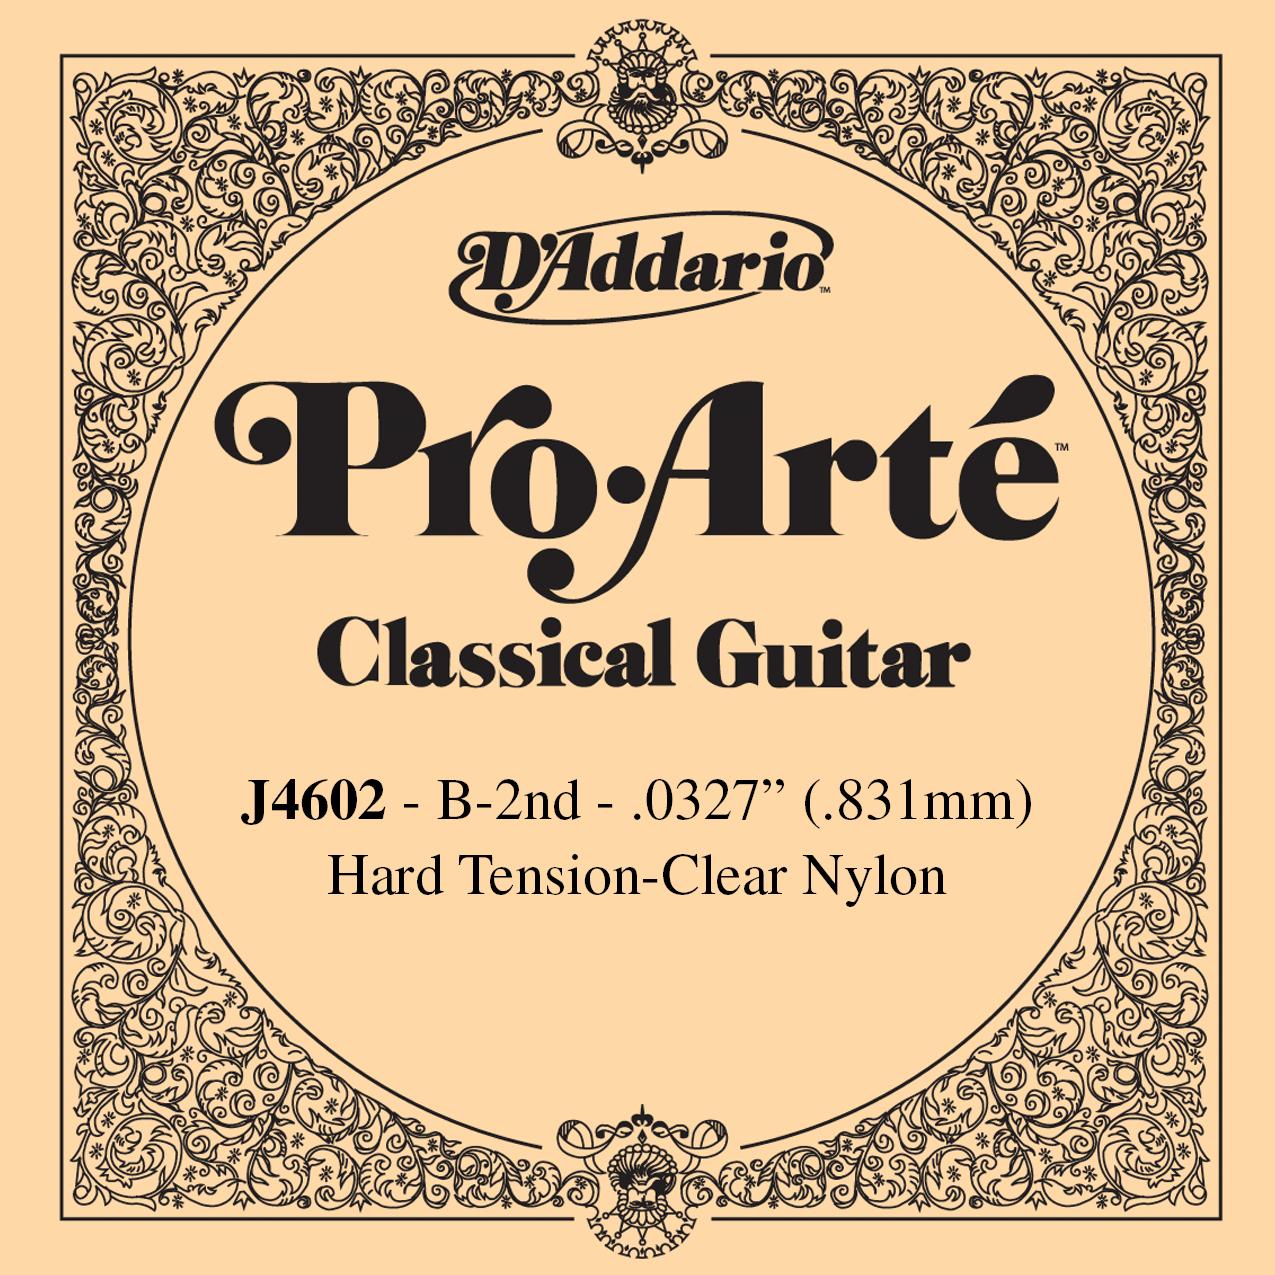 D'Addario J4602 Pro-Arte Nylon Classical Guitar Single String, Hard Tension, 2nd String B